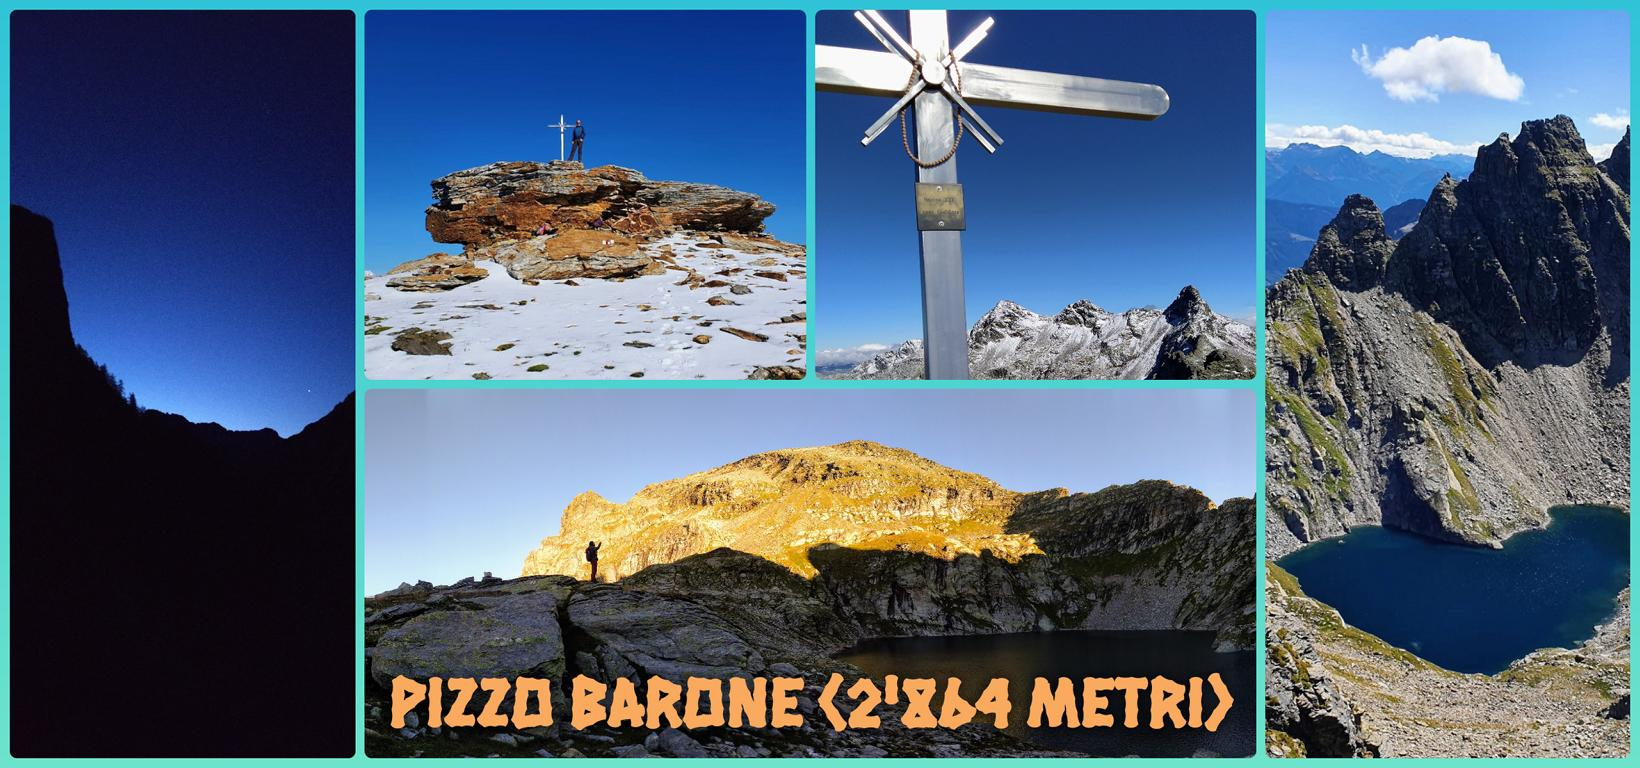 Pizzo-Barone-2864-metri